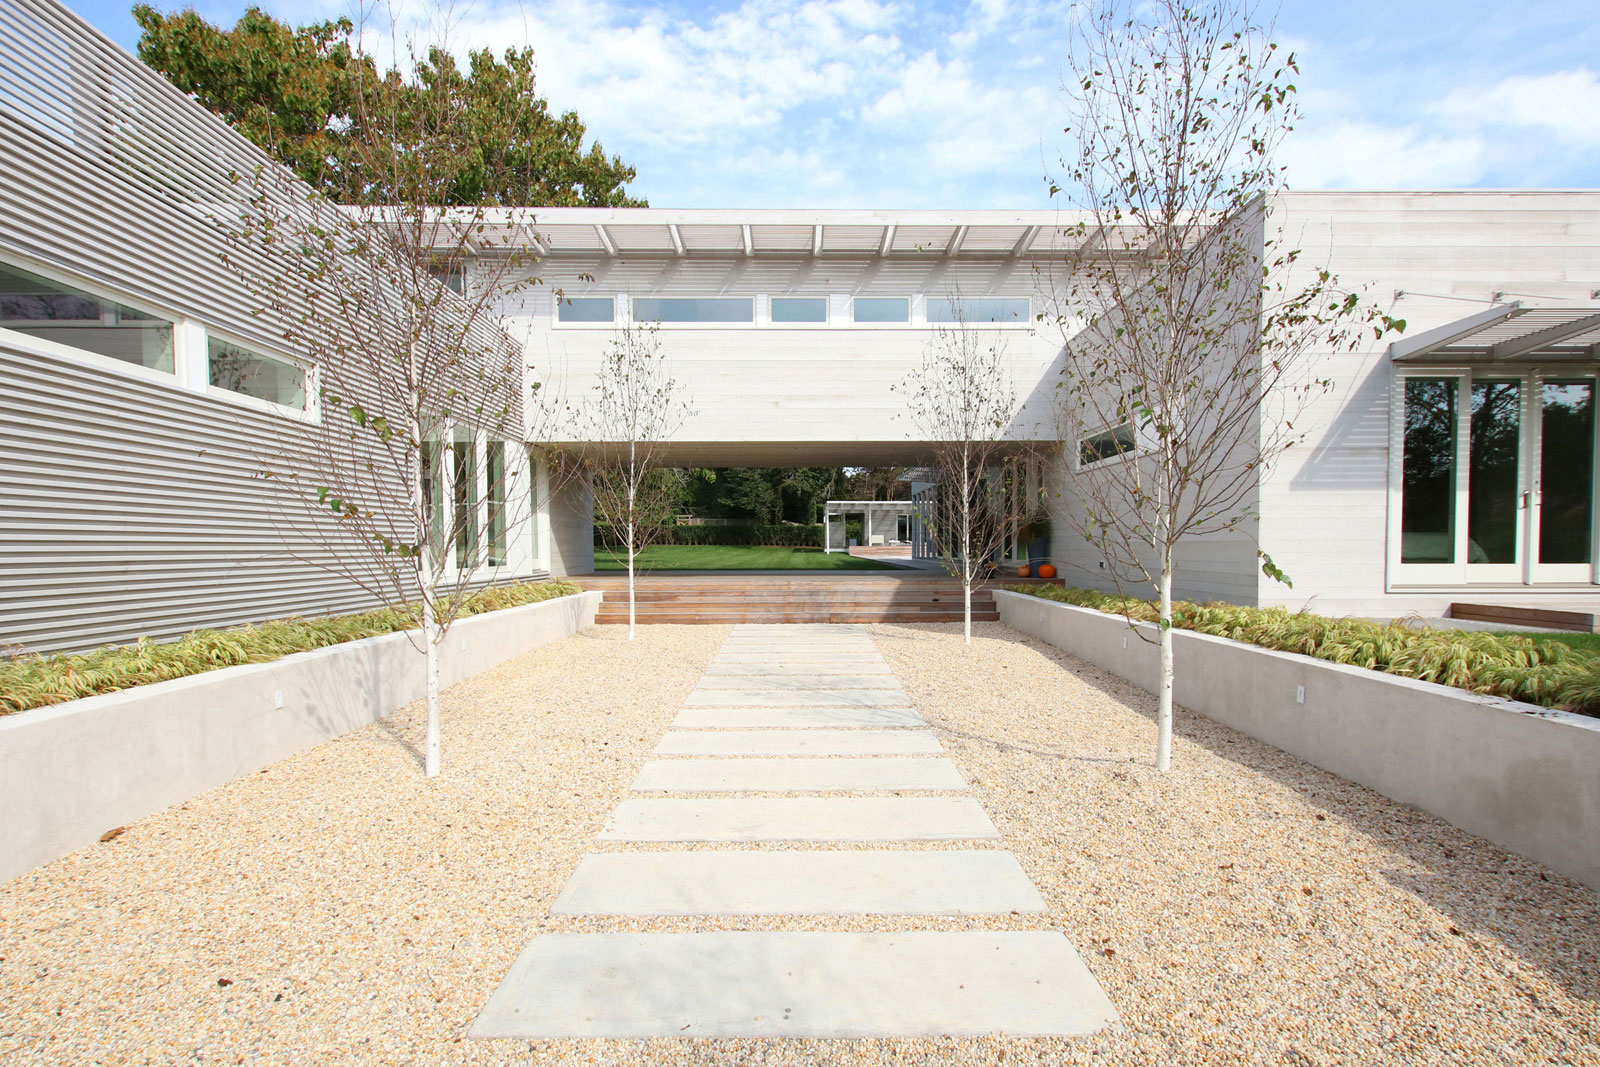 1-re4a-resolution-4-architecture-modern-modular-prefab-bridgehampton house-exterior.jpg